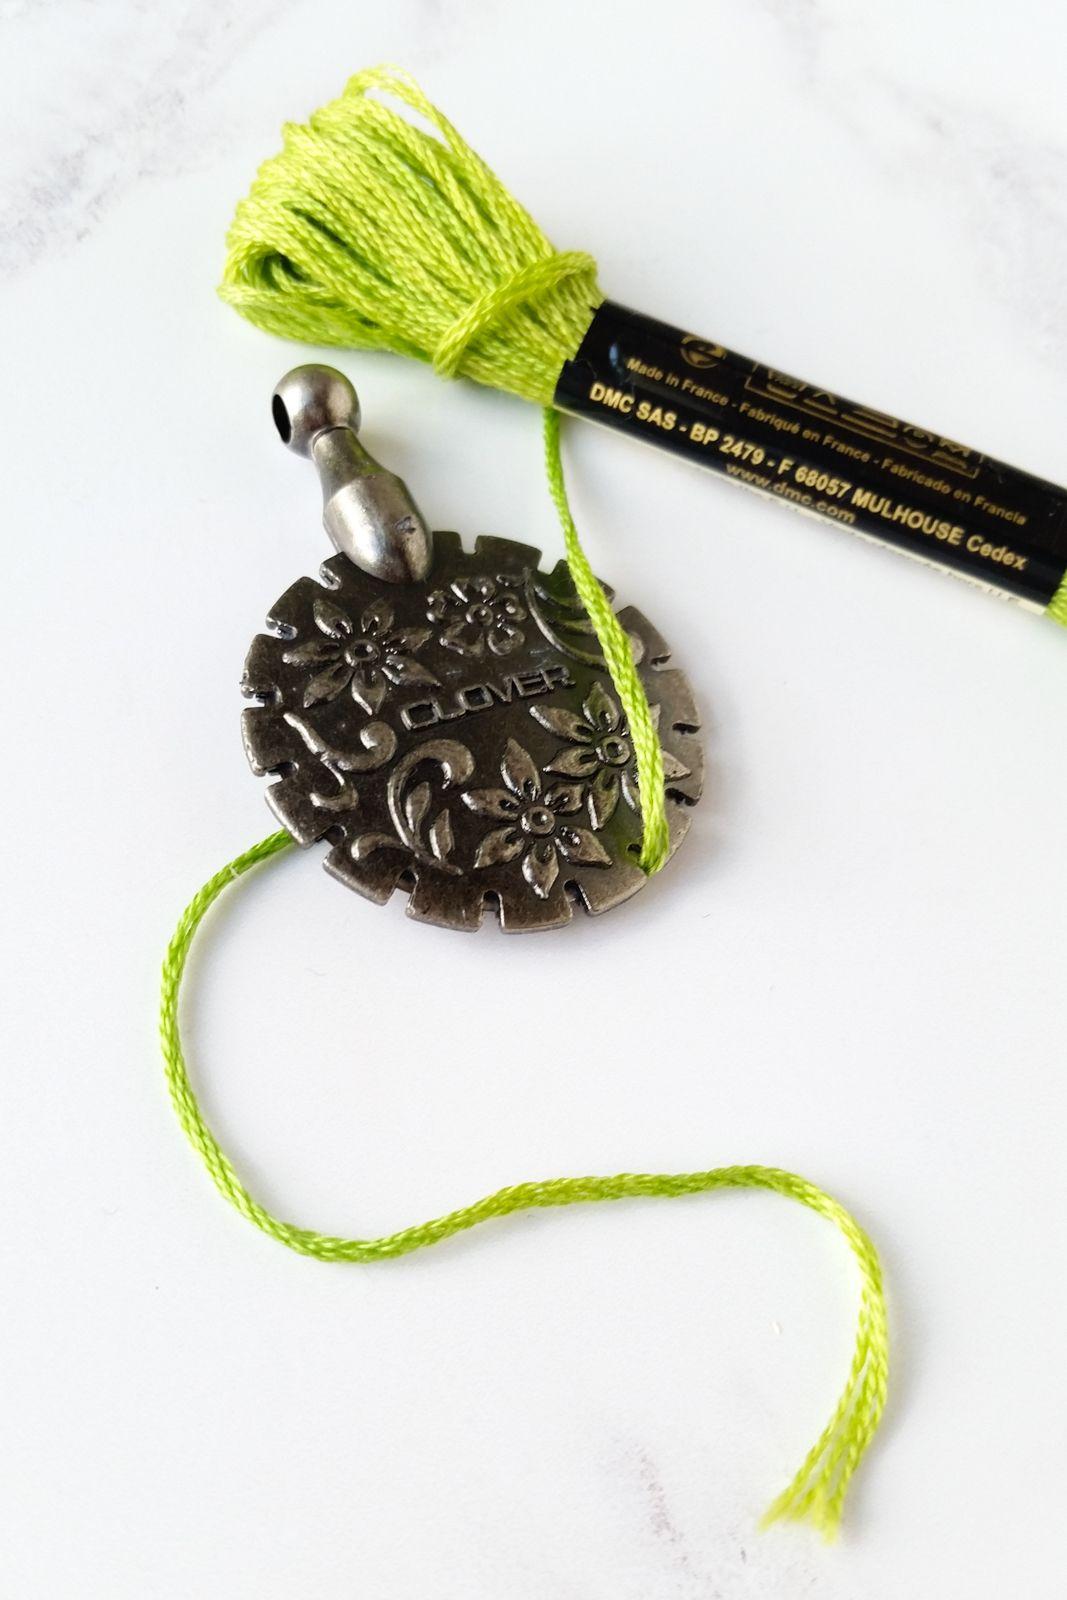 Clover thread cutter pendant stitch pendants and embroidery scissors clover thread cutter pendant mozeypictures Gallery